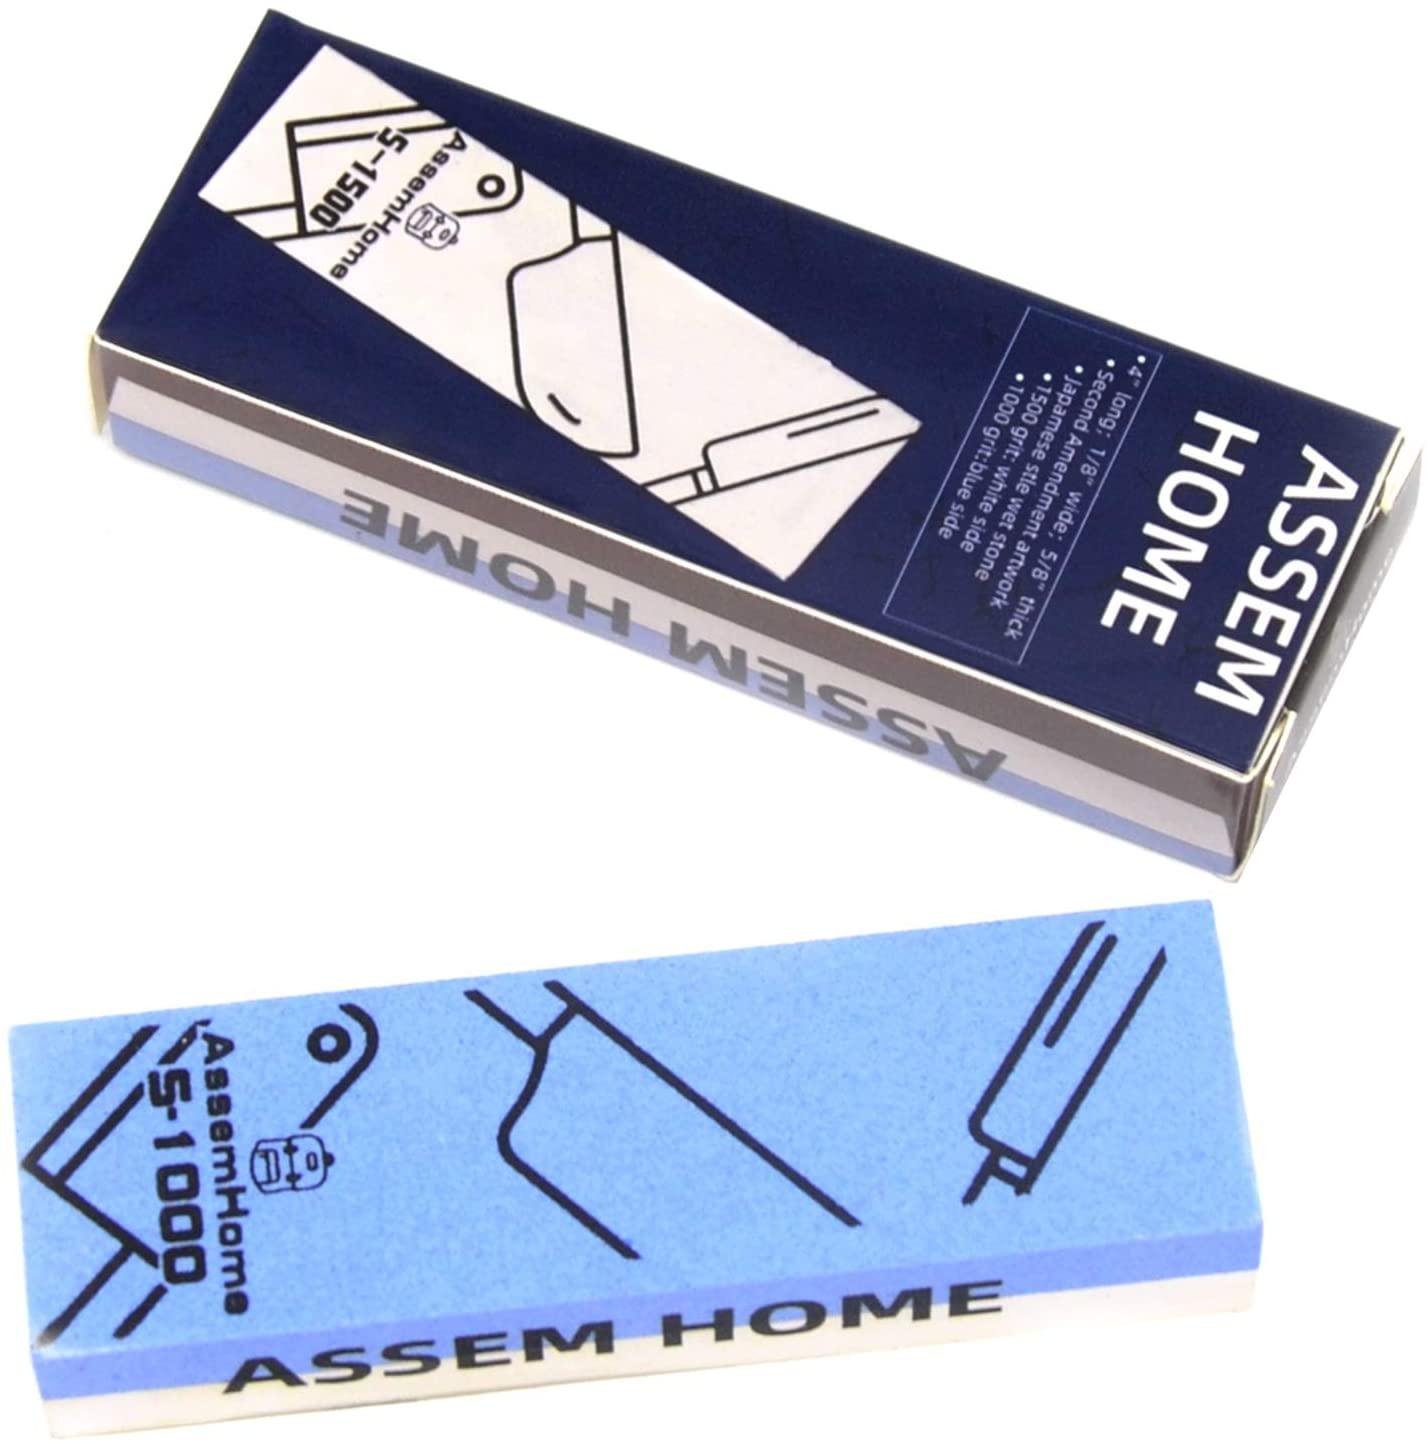 Fine Whetstone Professional Knife Sharpener Wet Sharpening Stone Dual Sided 1000/1500 Grit Water Stones Polishing Stone for Kitchen Tools